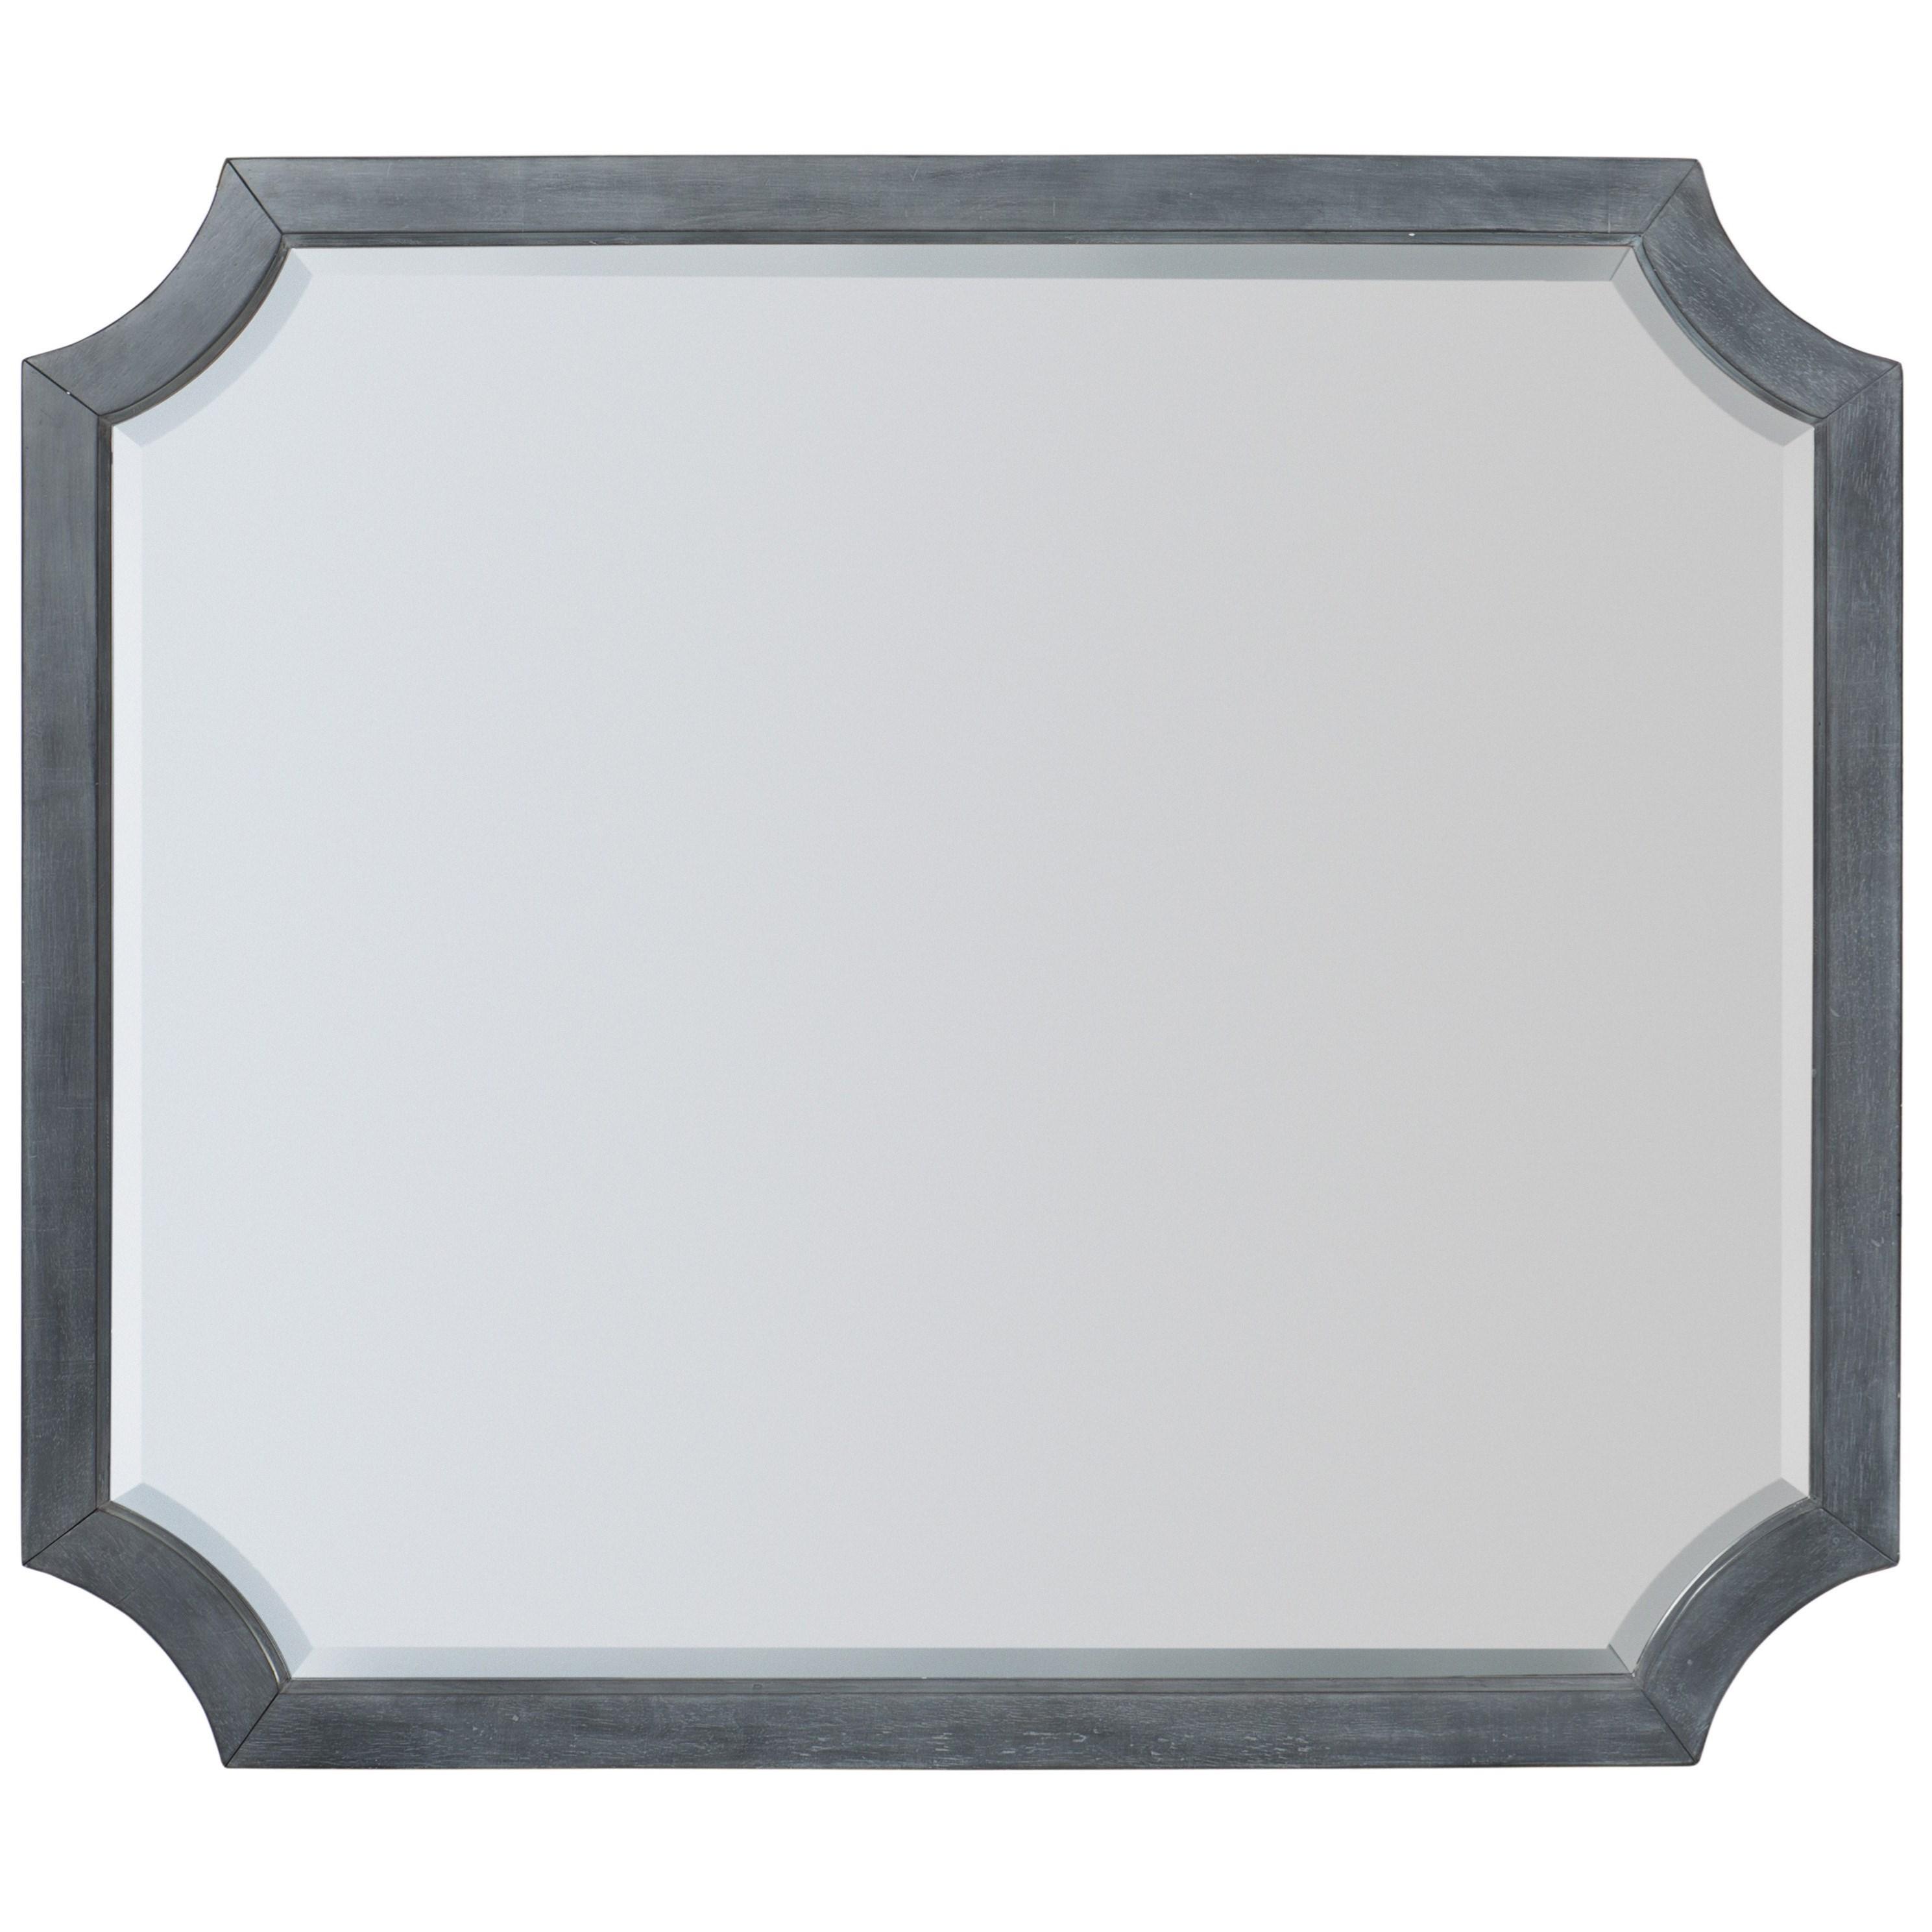 Hamilton Mirror by Hooker Furniture at Stoney Creek Furniture